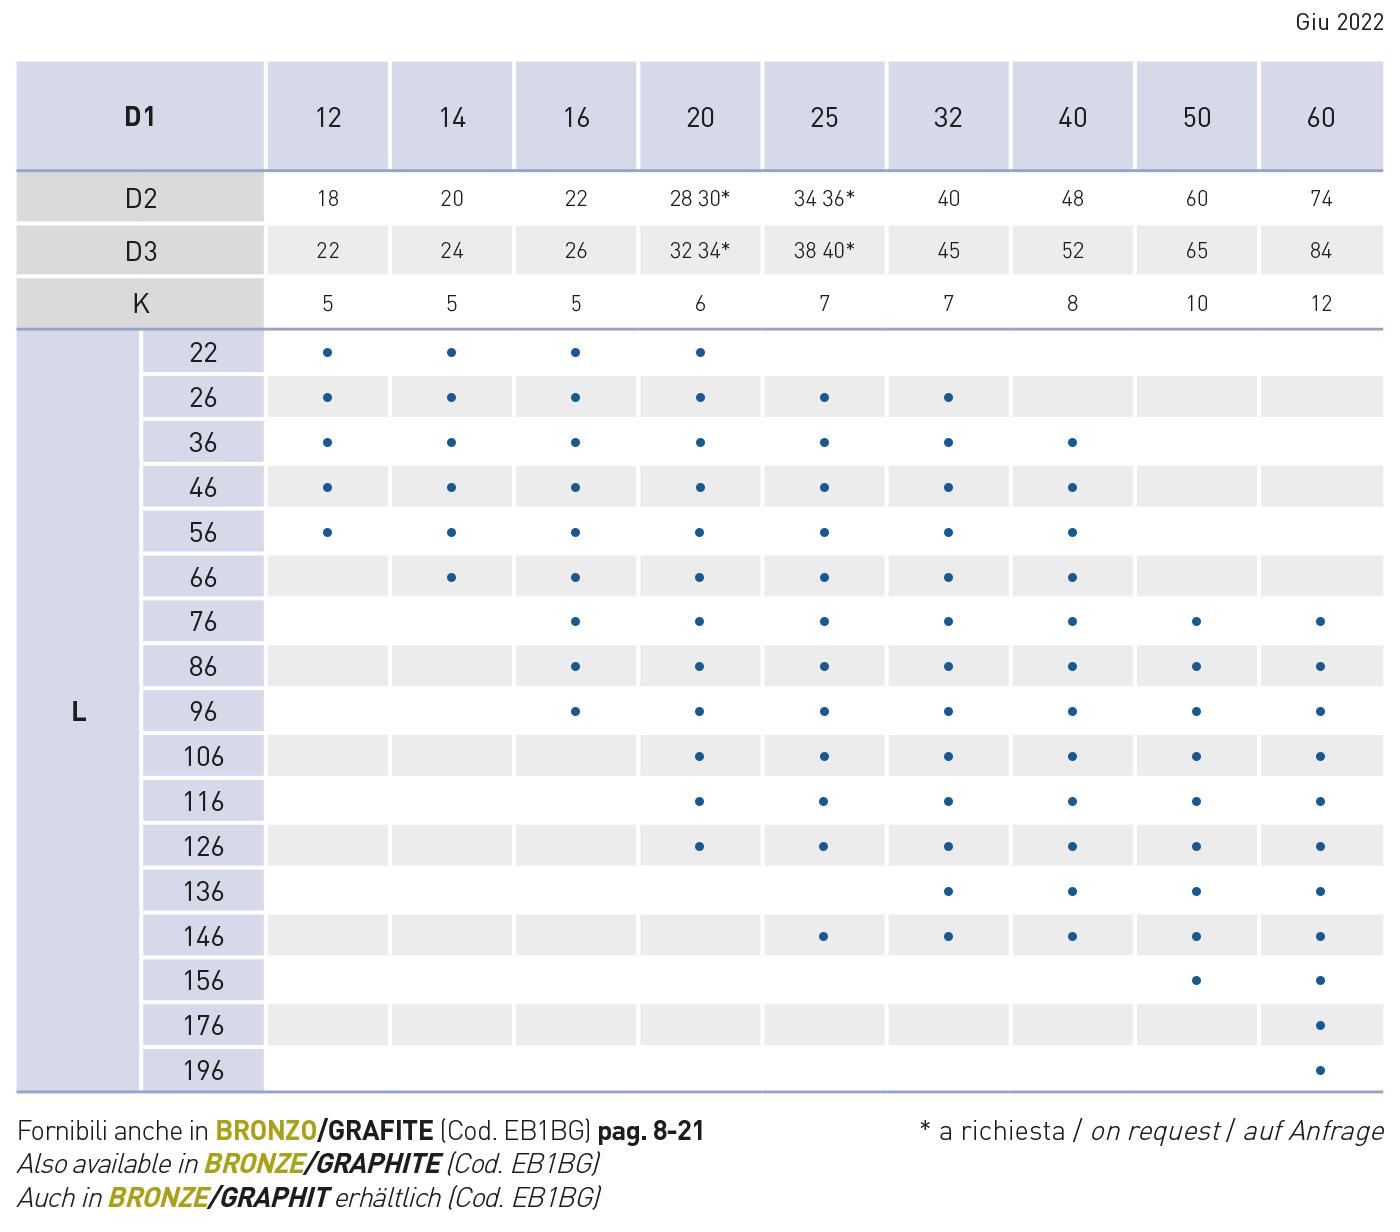 tabella bussola guida bronzo integrale EB1B